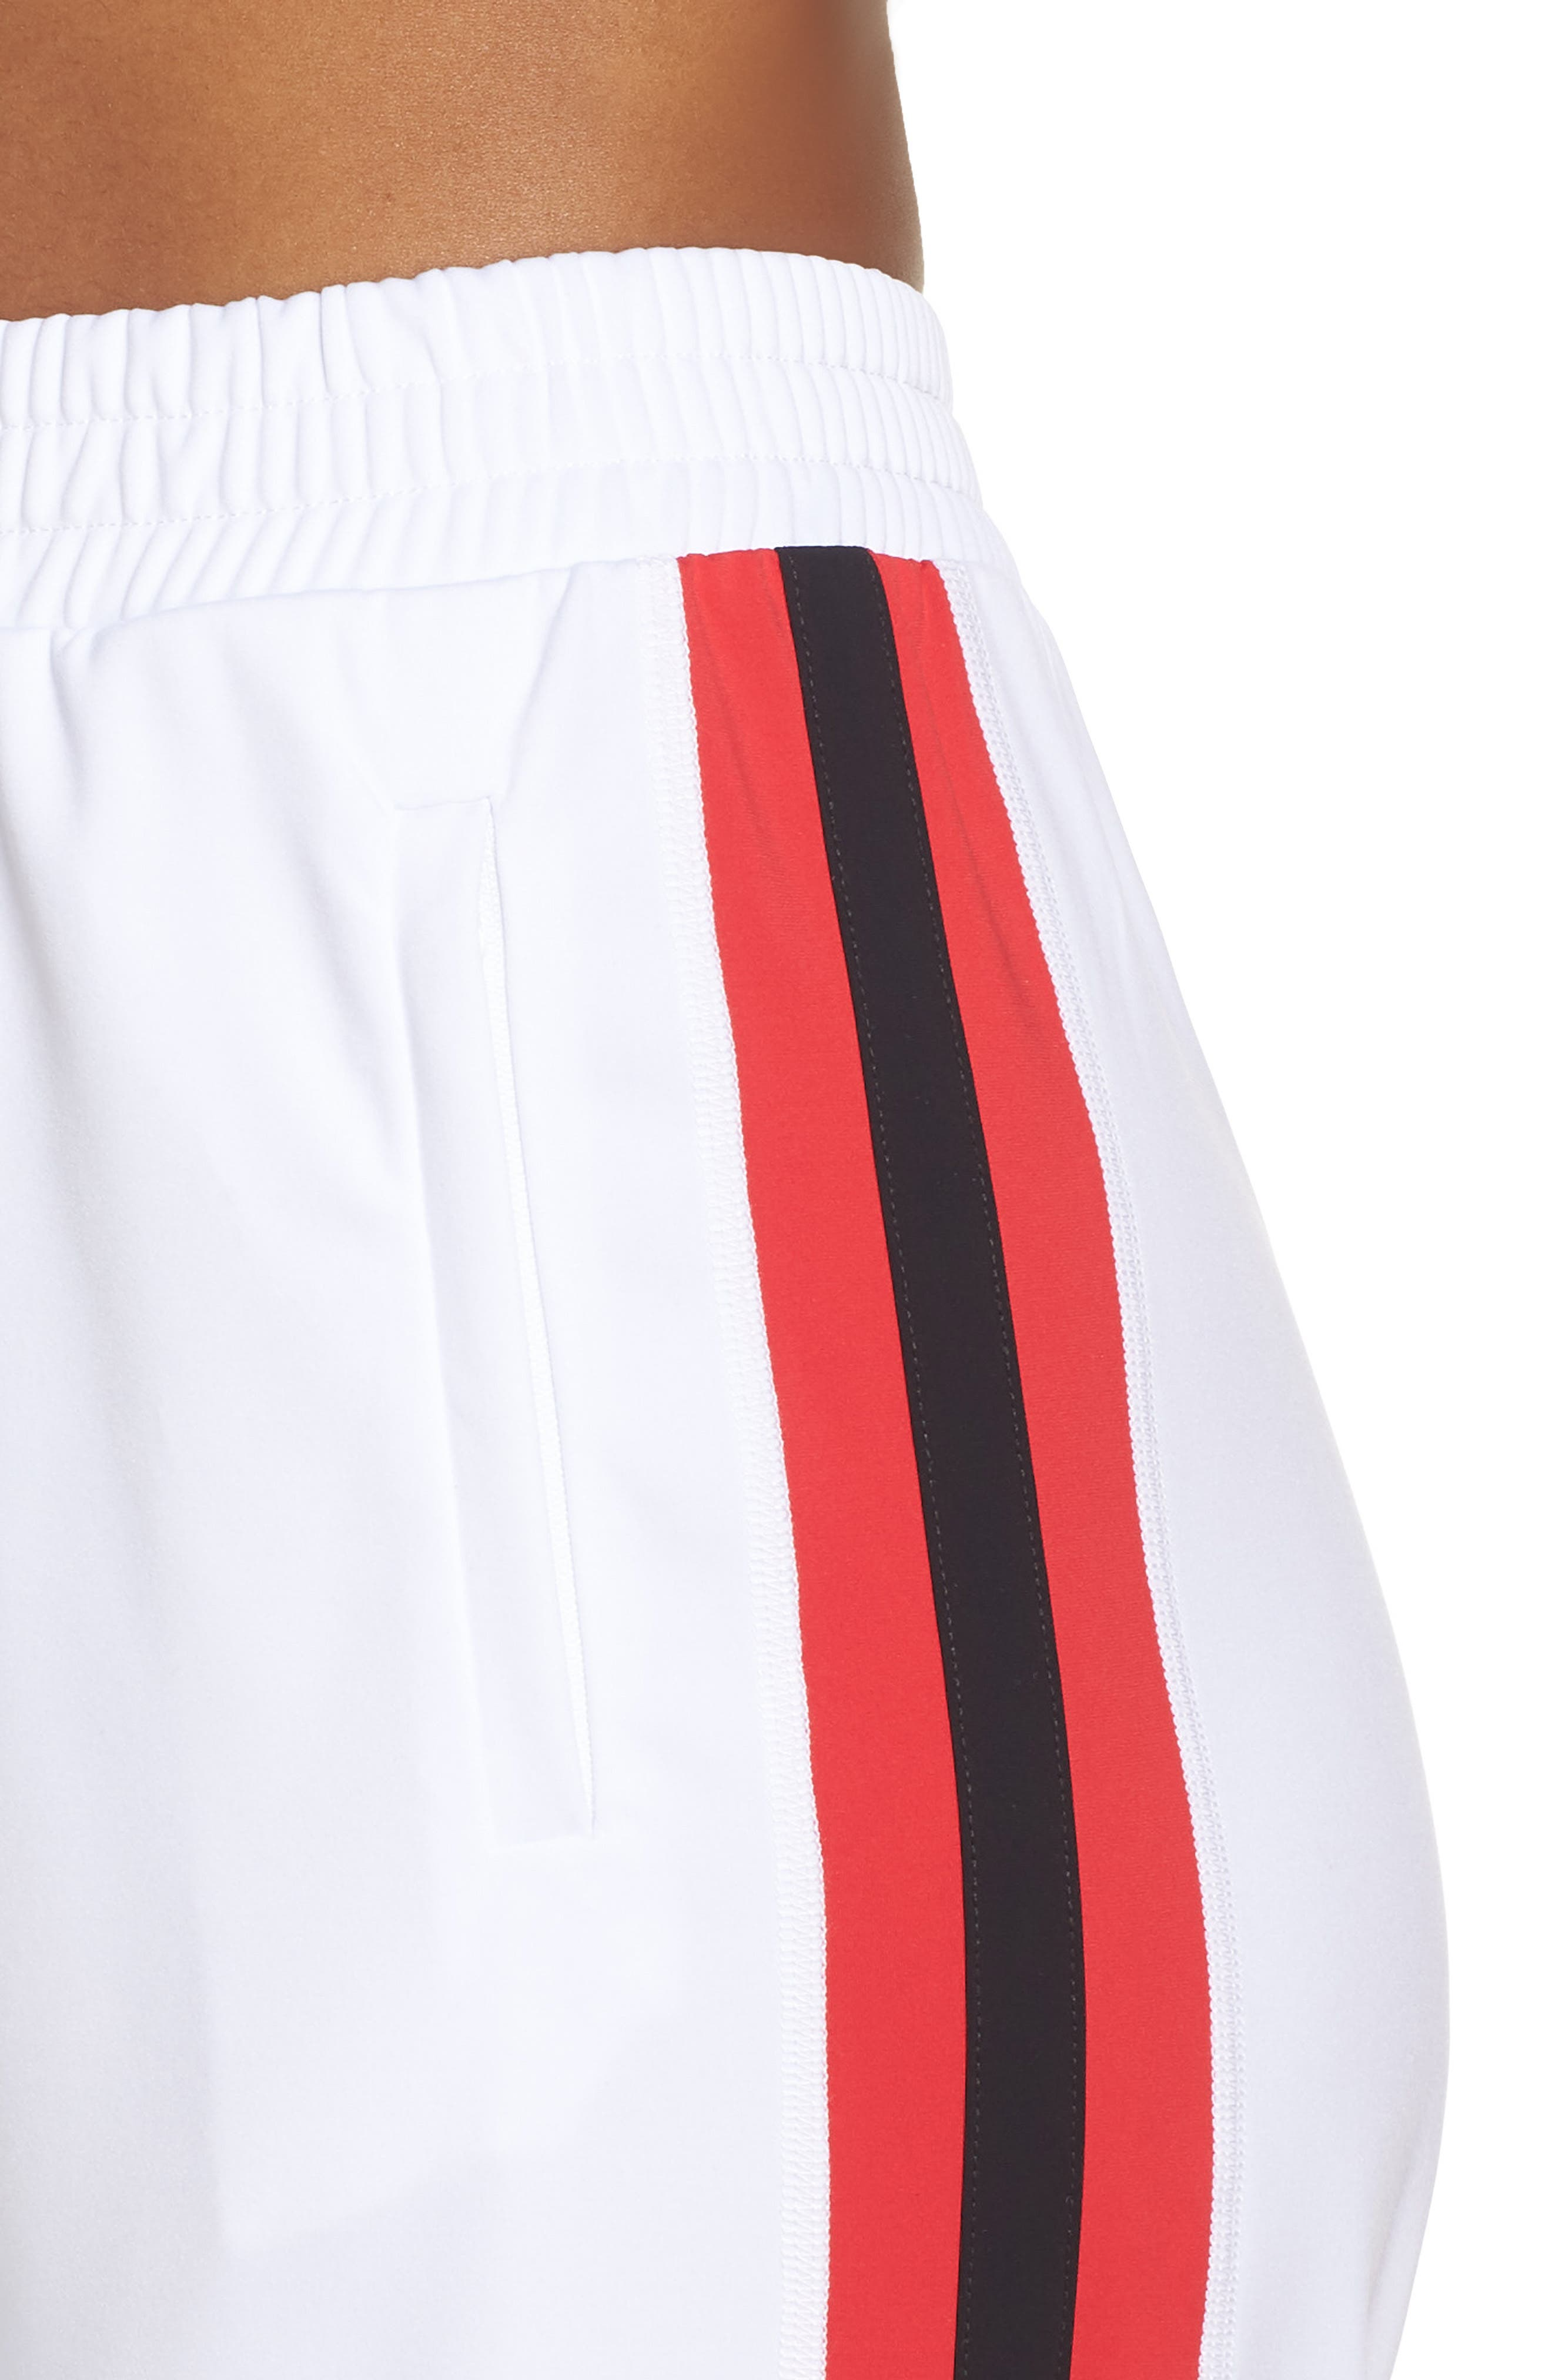 Wide Leg Track Pants,                             Alternate thumbnail 4, color,                             White/ Red/ Black